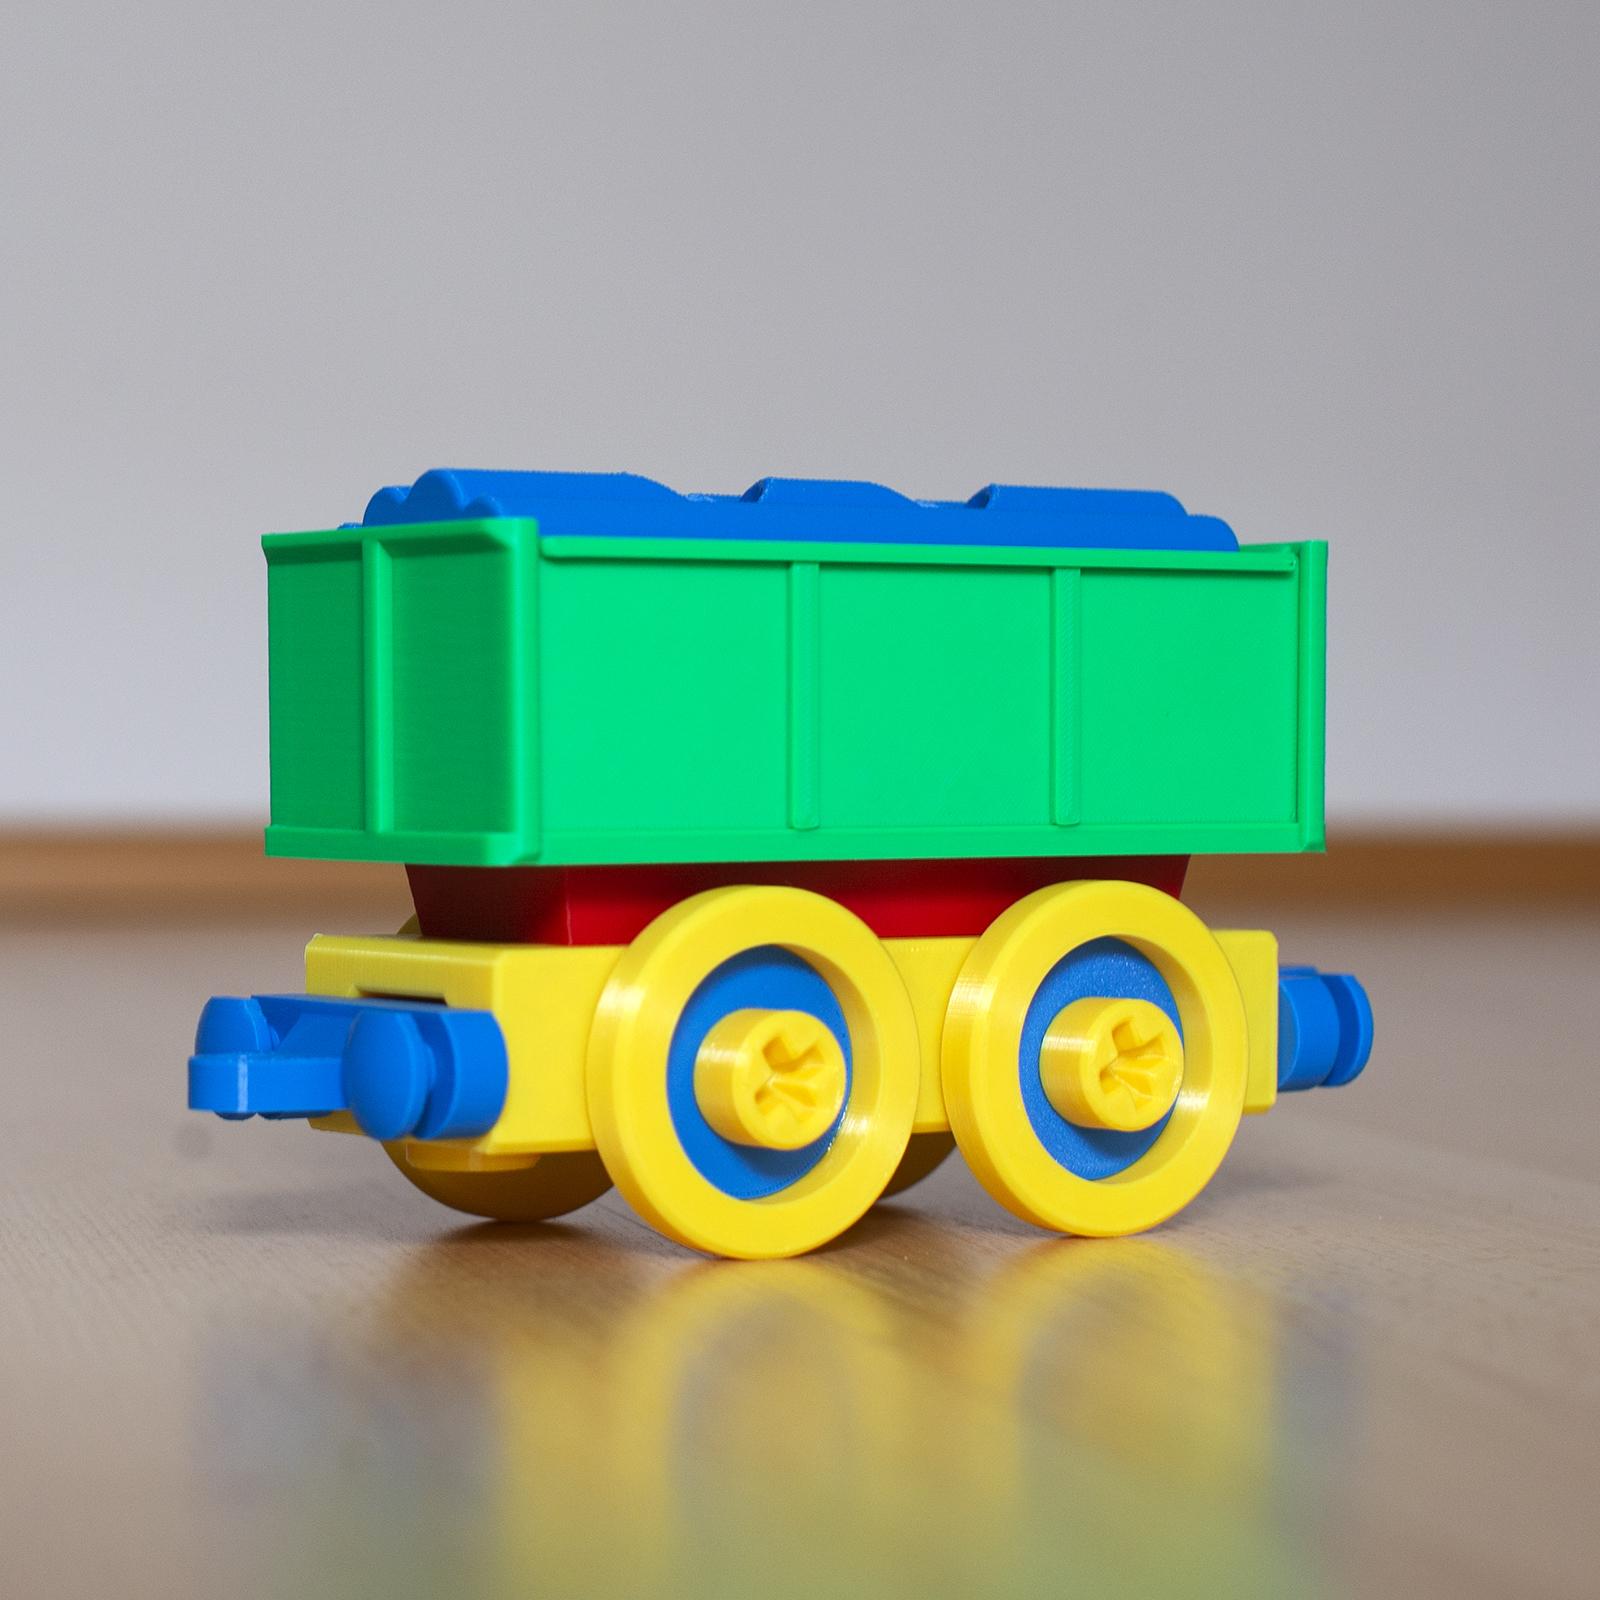 cargo.jpg Download STL file Toy train construction set - whole train combo • 3D print object, kozakm